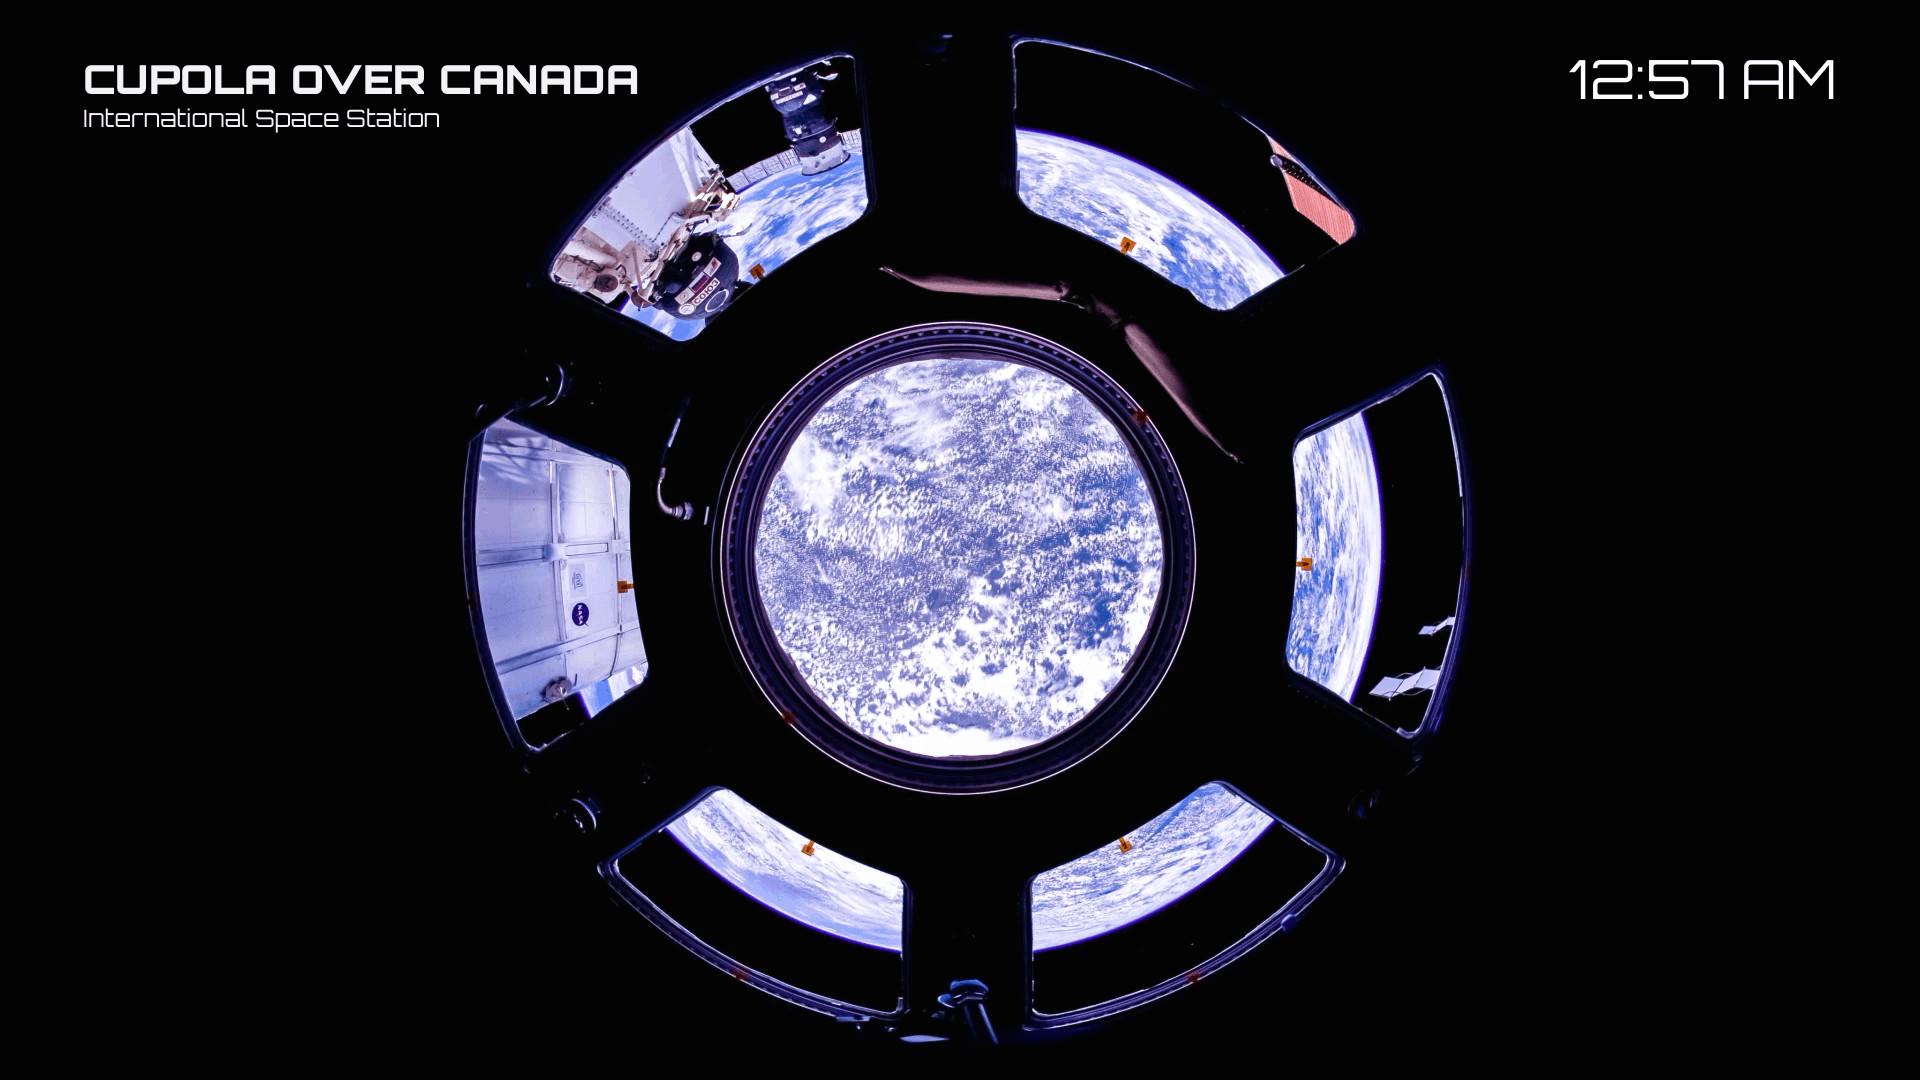 Canada through the ISS cupola window.